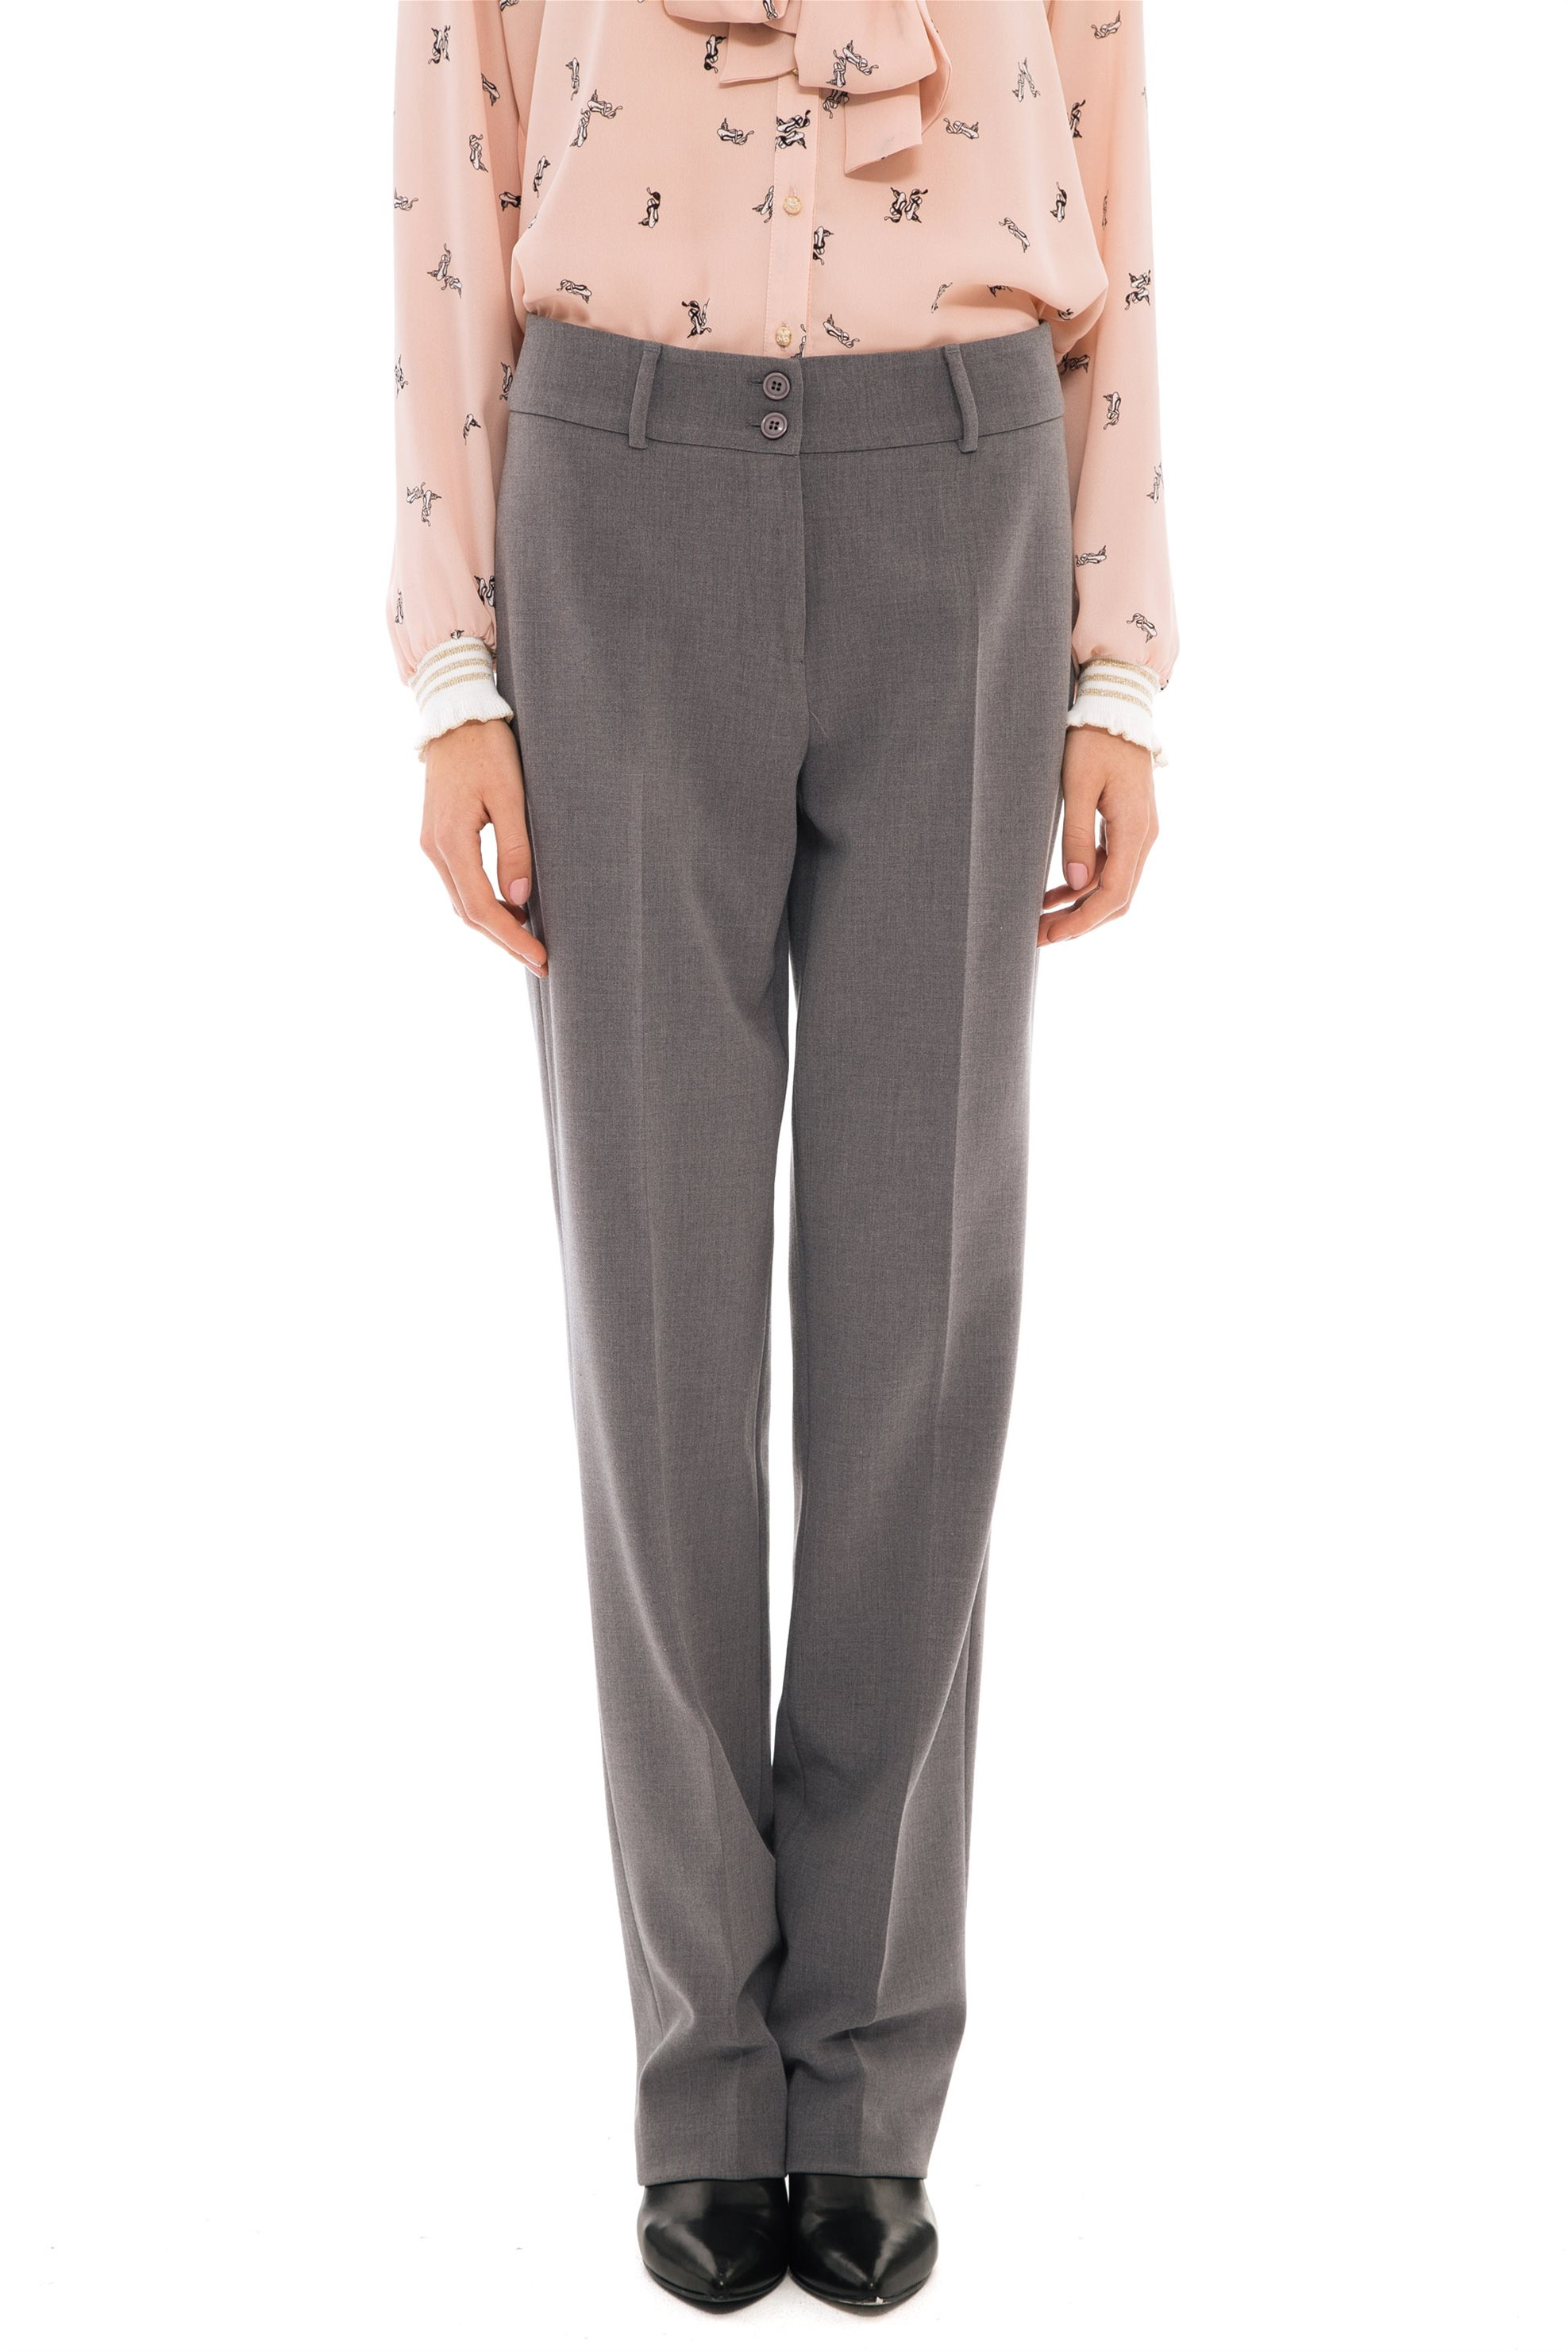 3e2eec27ad0 Notos Bella P γυναικείο παντελόνι υφασμάτινο σε κλασσική γραμμή -  21.182.Β03.103 - Γκρι